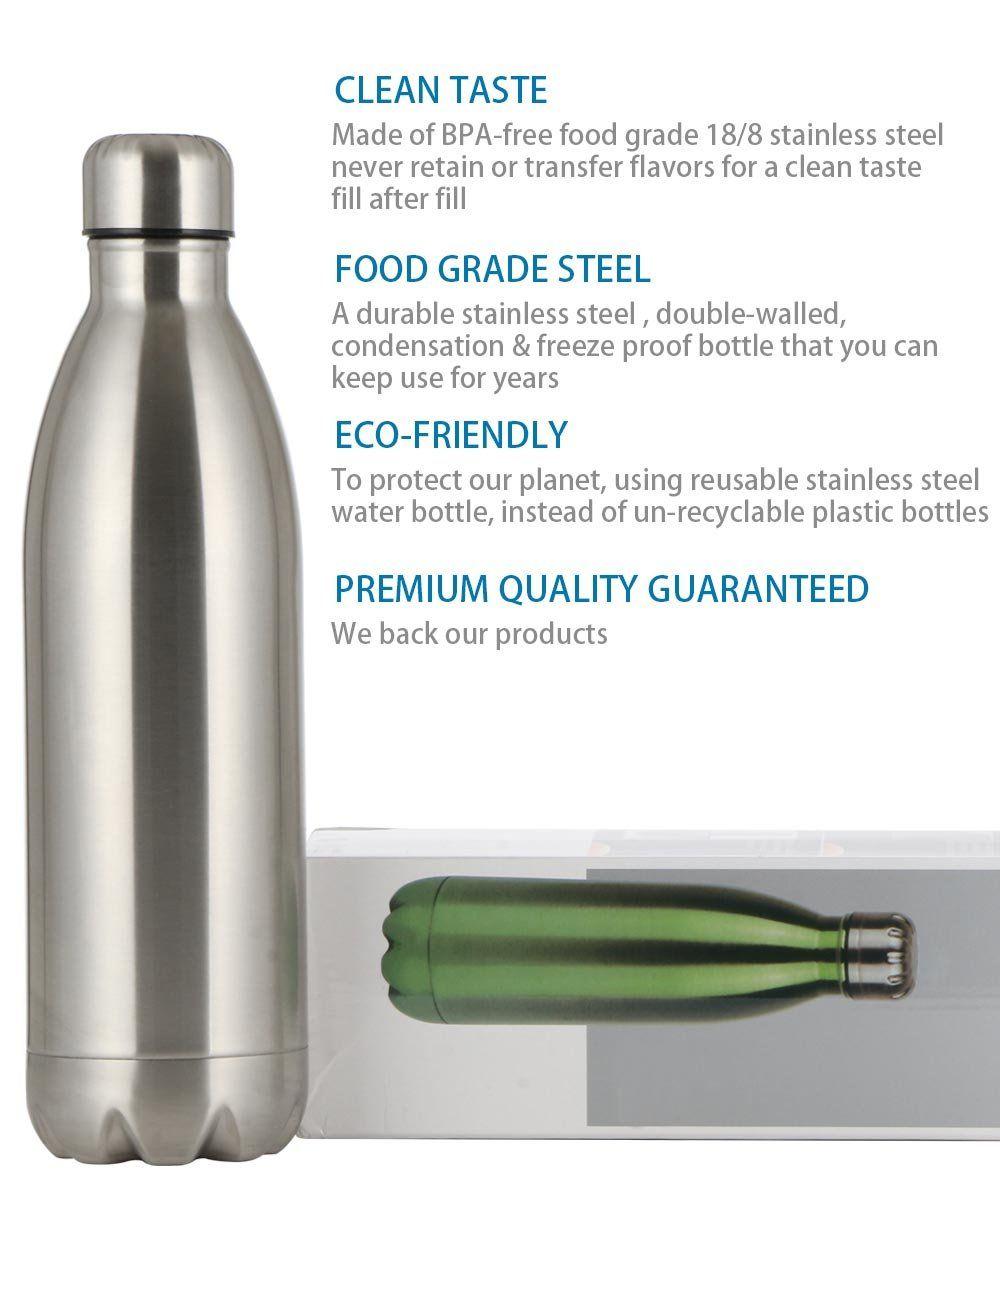 food grade stainless steel water bottle